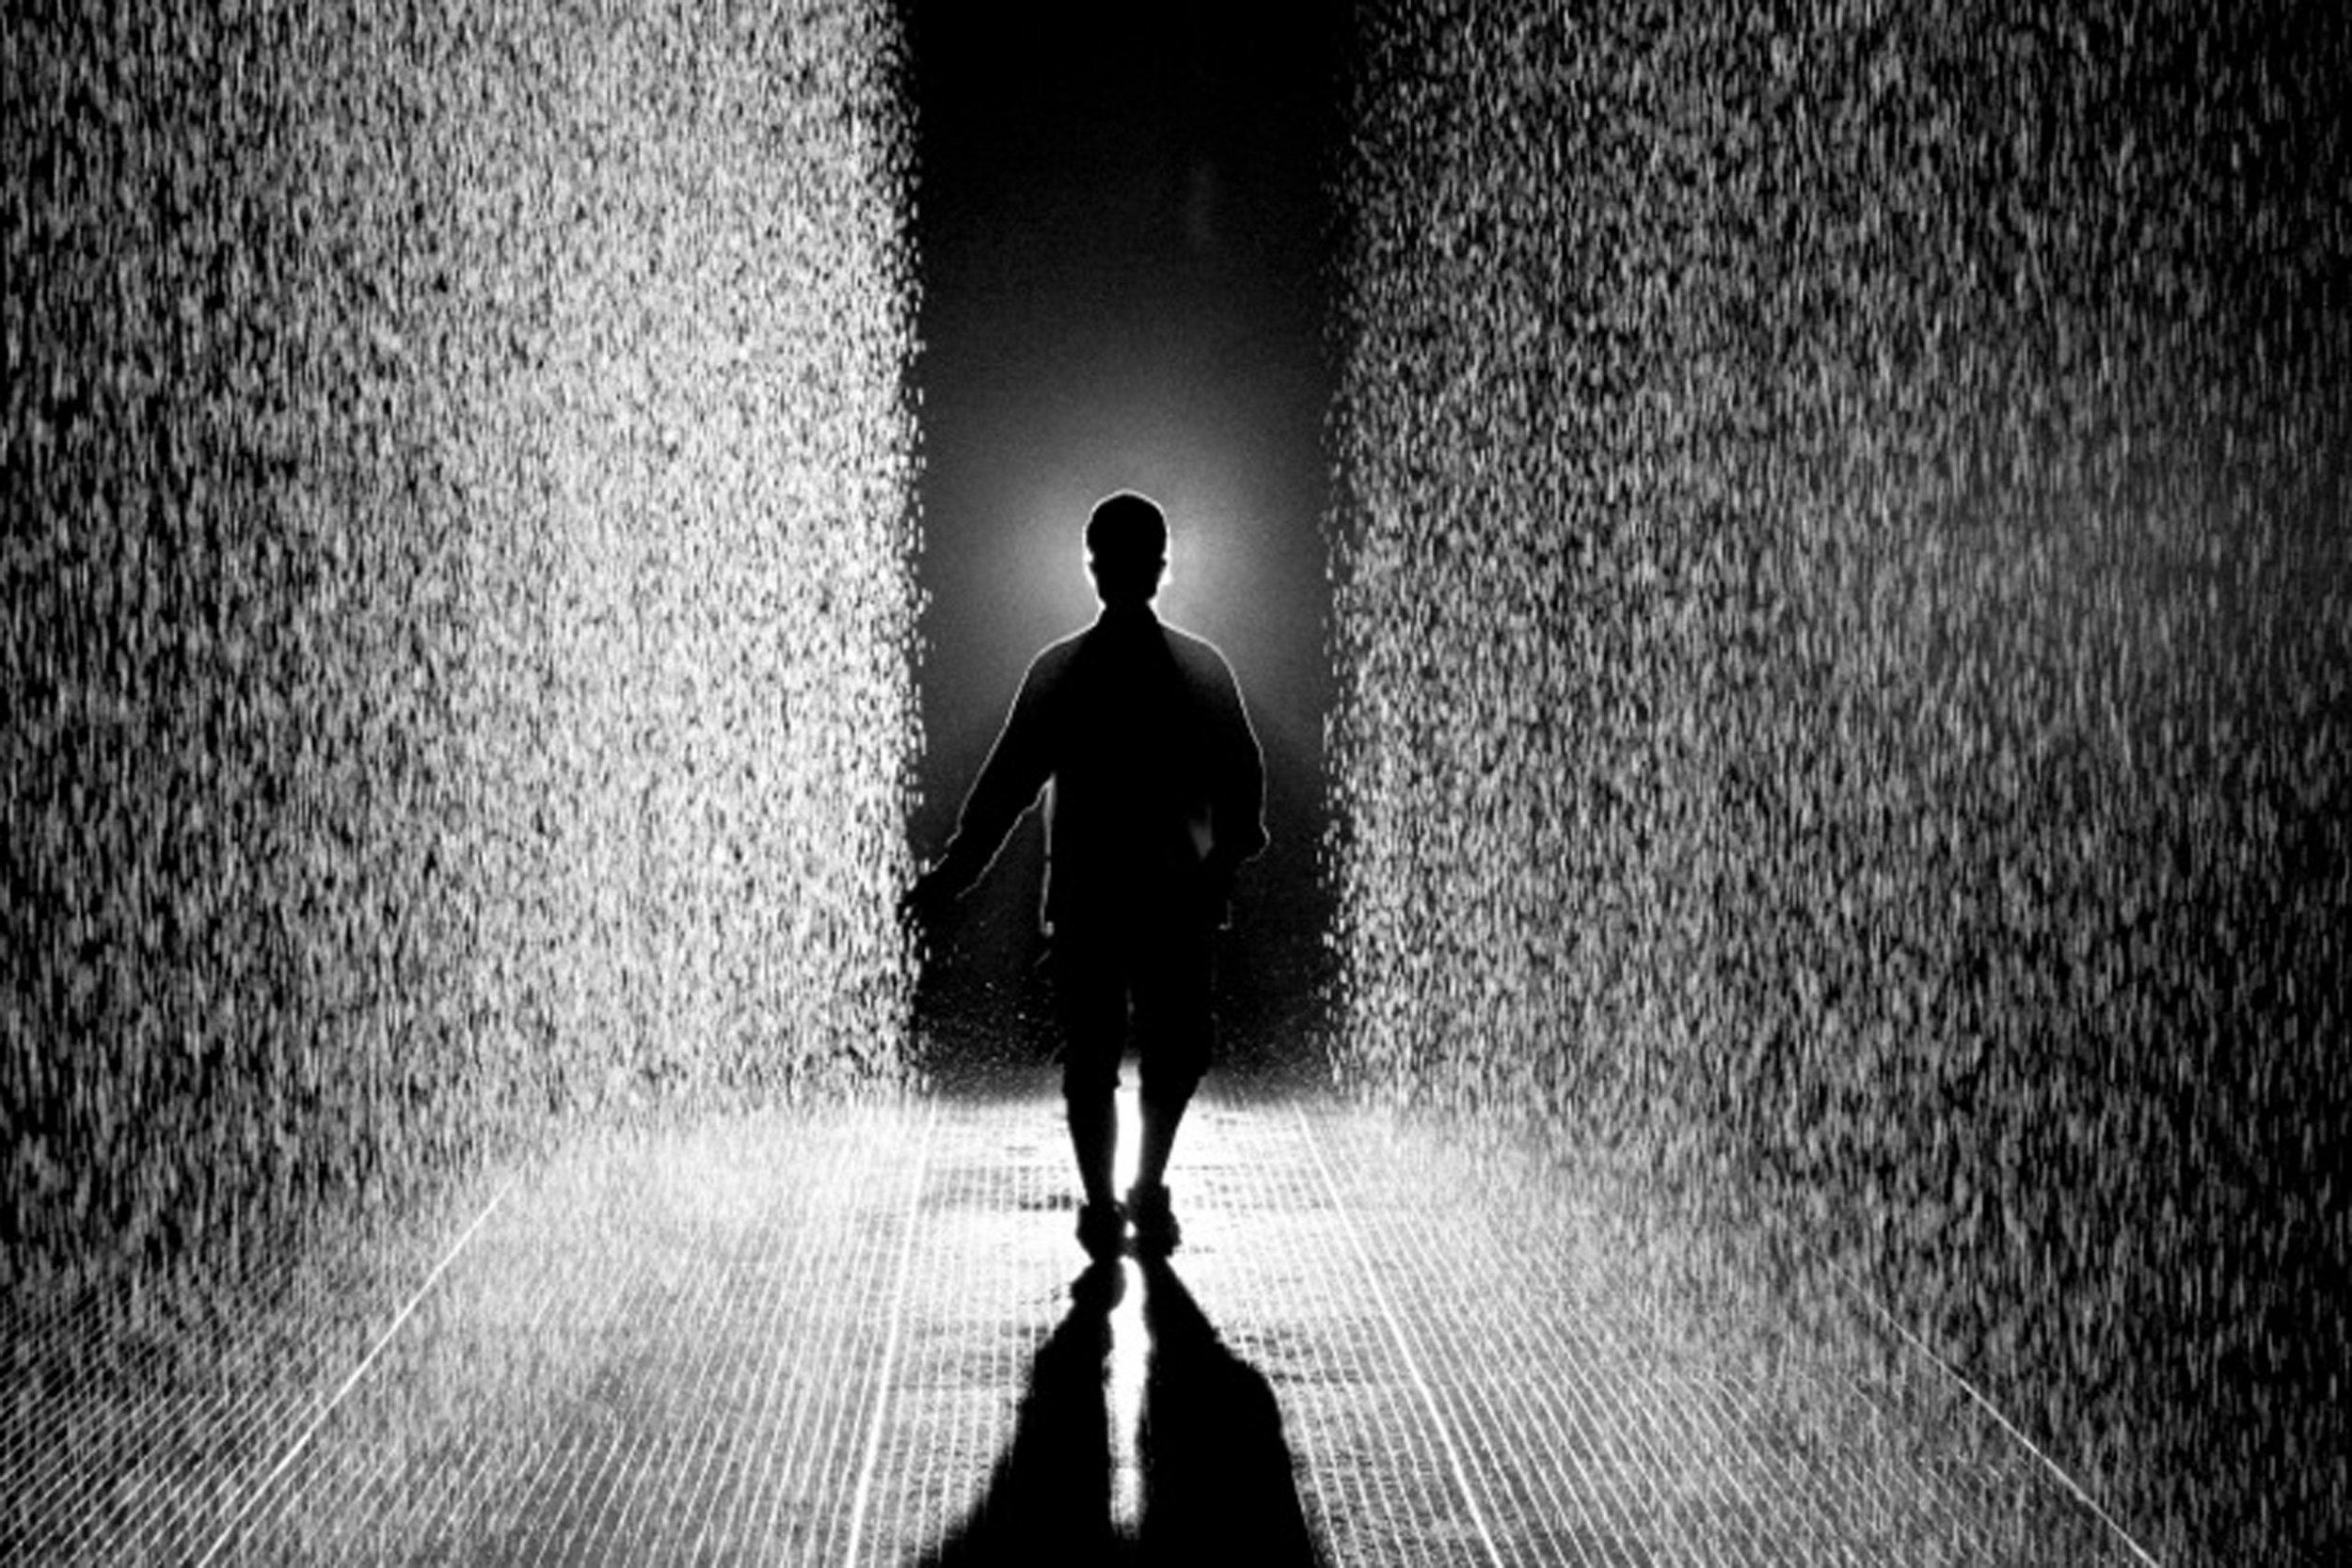 130515-cutruzzula-rainroom-tease